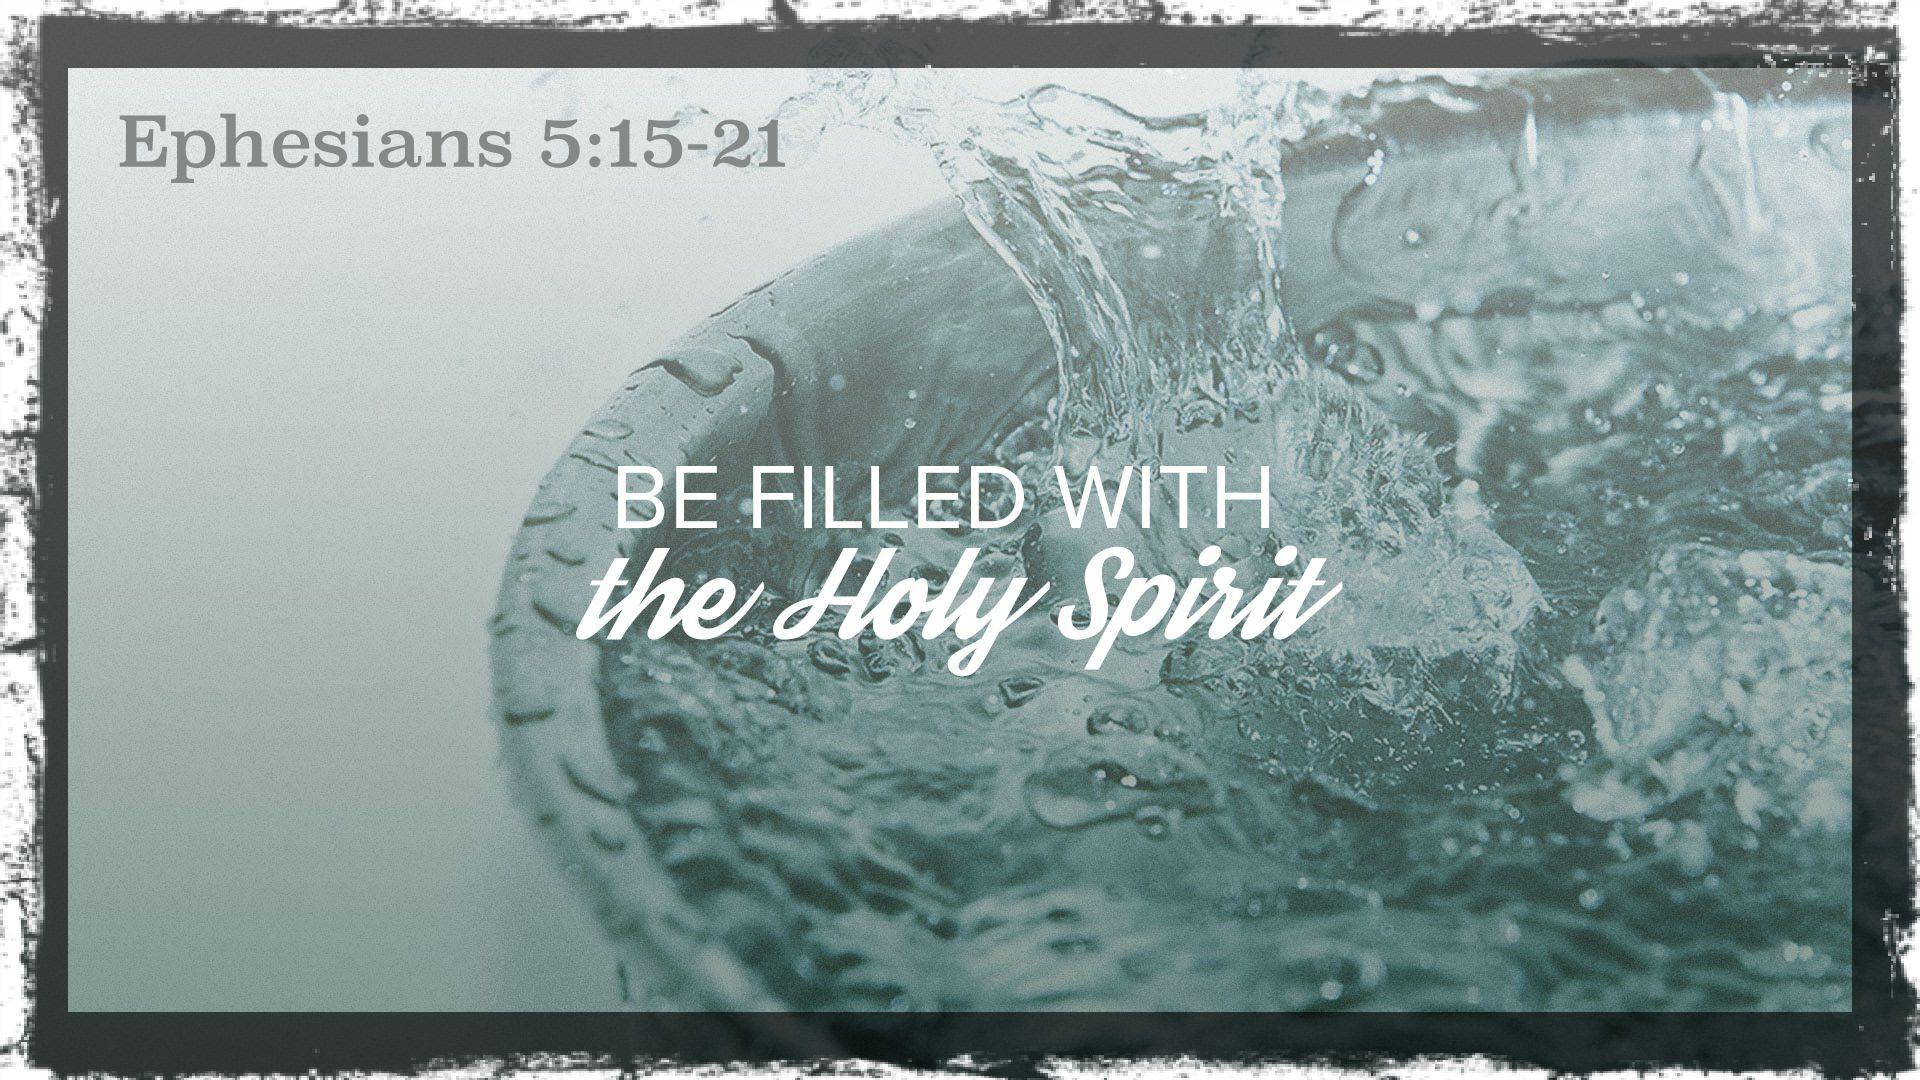 Hunger and Thirst, The Spirit of God 03-31-19.jpg